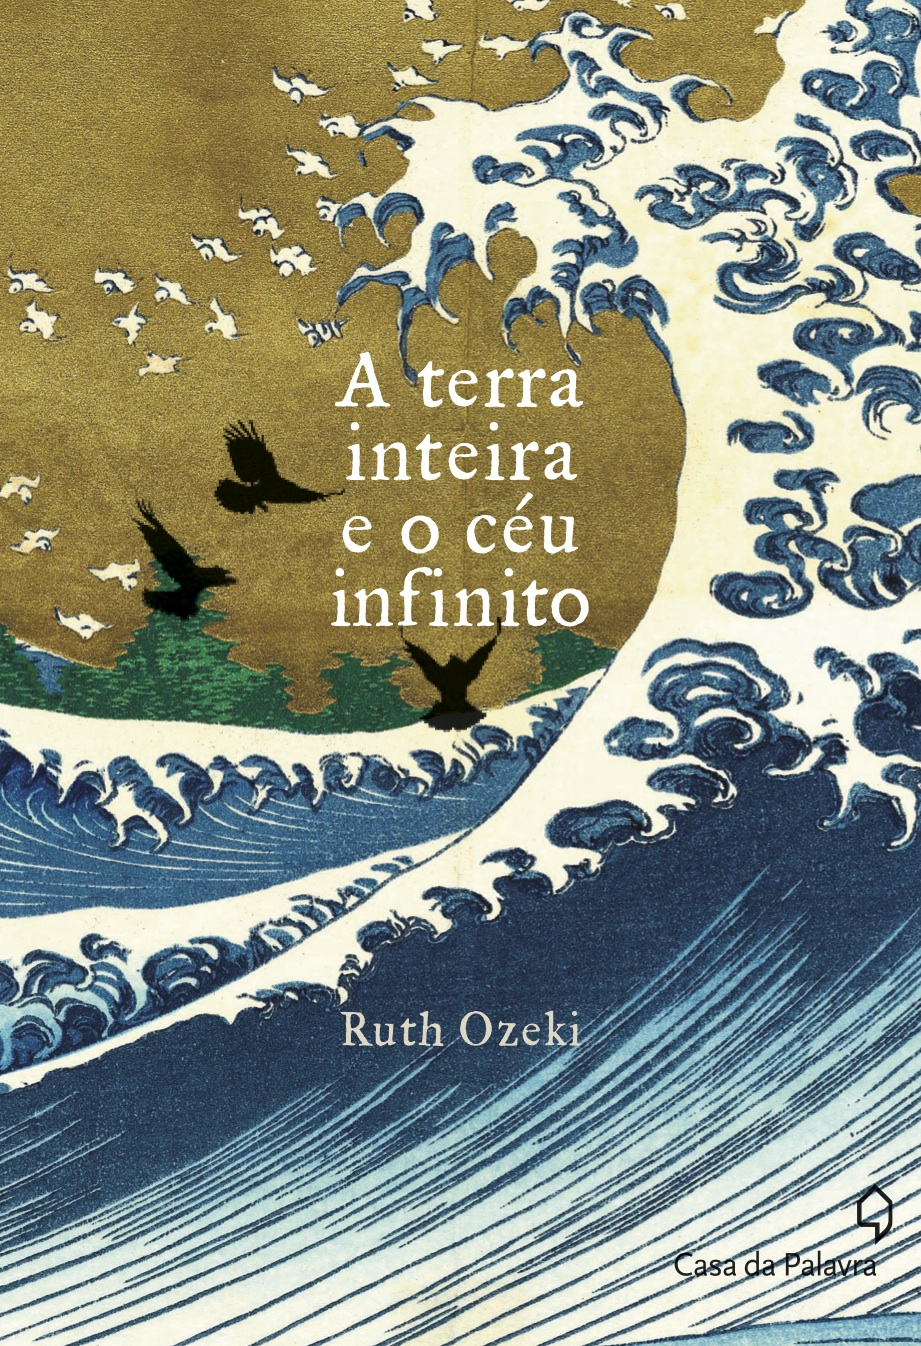 Brazilian Edition